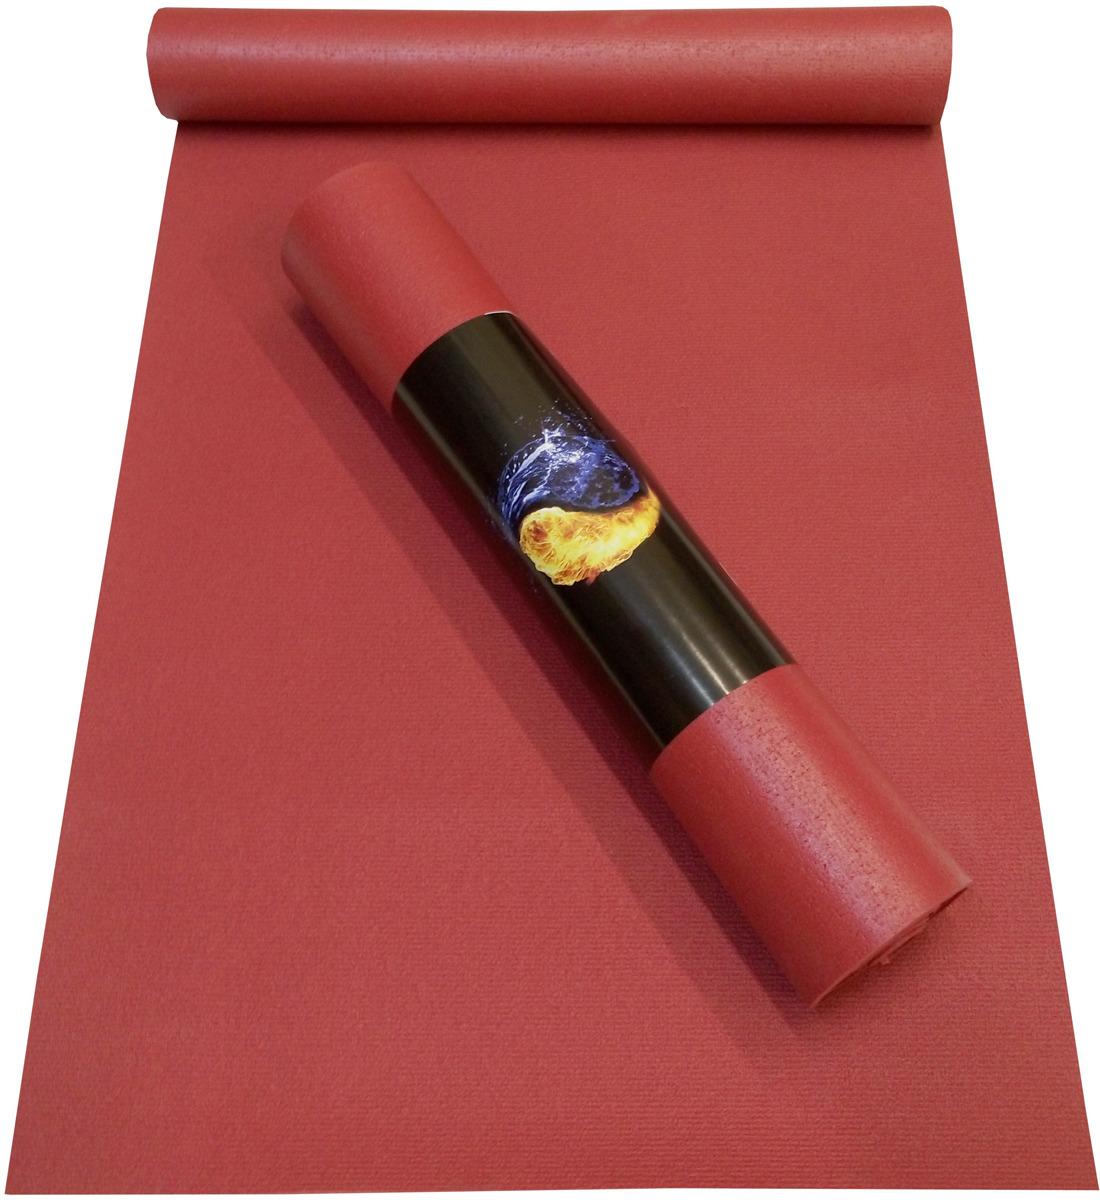 Коврик для йоги детский Ako-Yoga Yin-Yang Studio, цвет: бордо, 150 х 60 х 0,3 см коврик для йоги ako yoga yin yang studio цвет синий 185 х 60 х 0 45 см